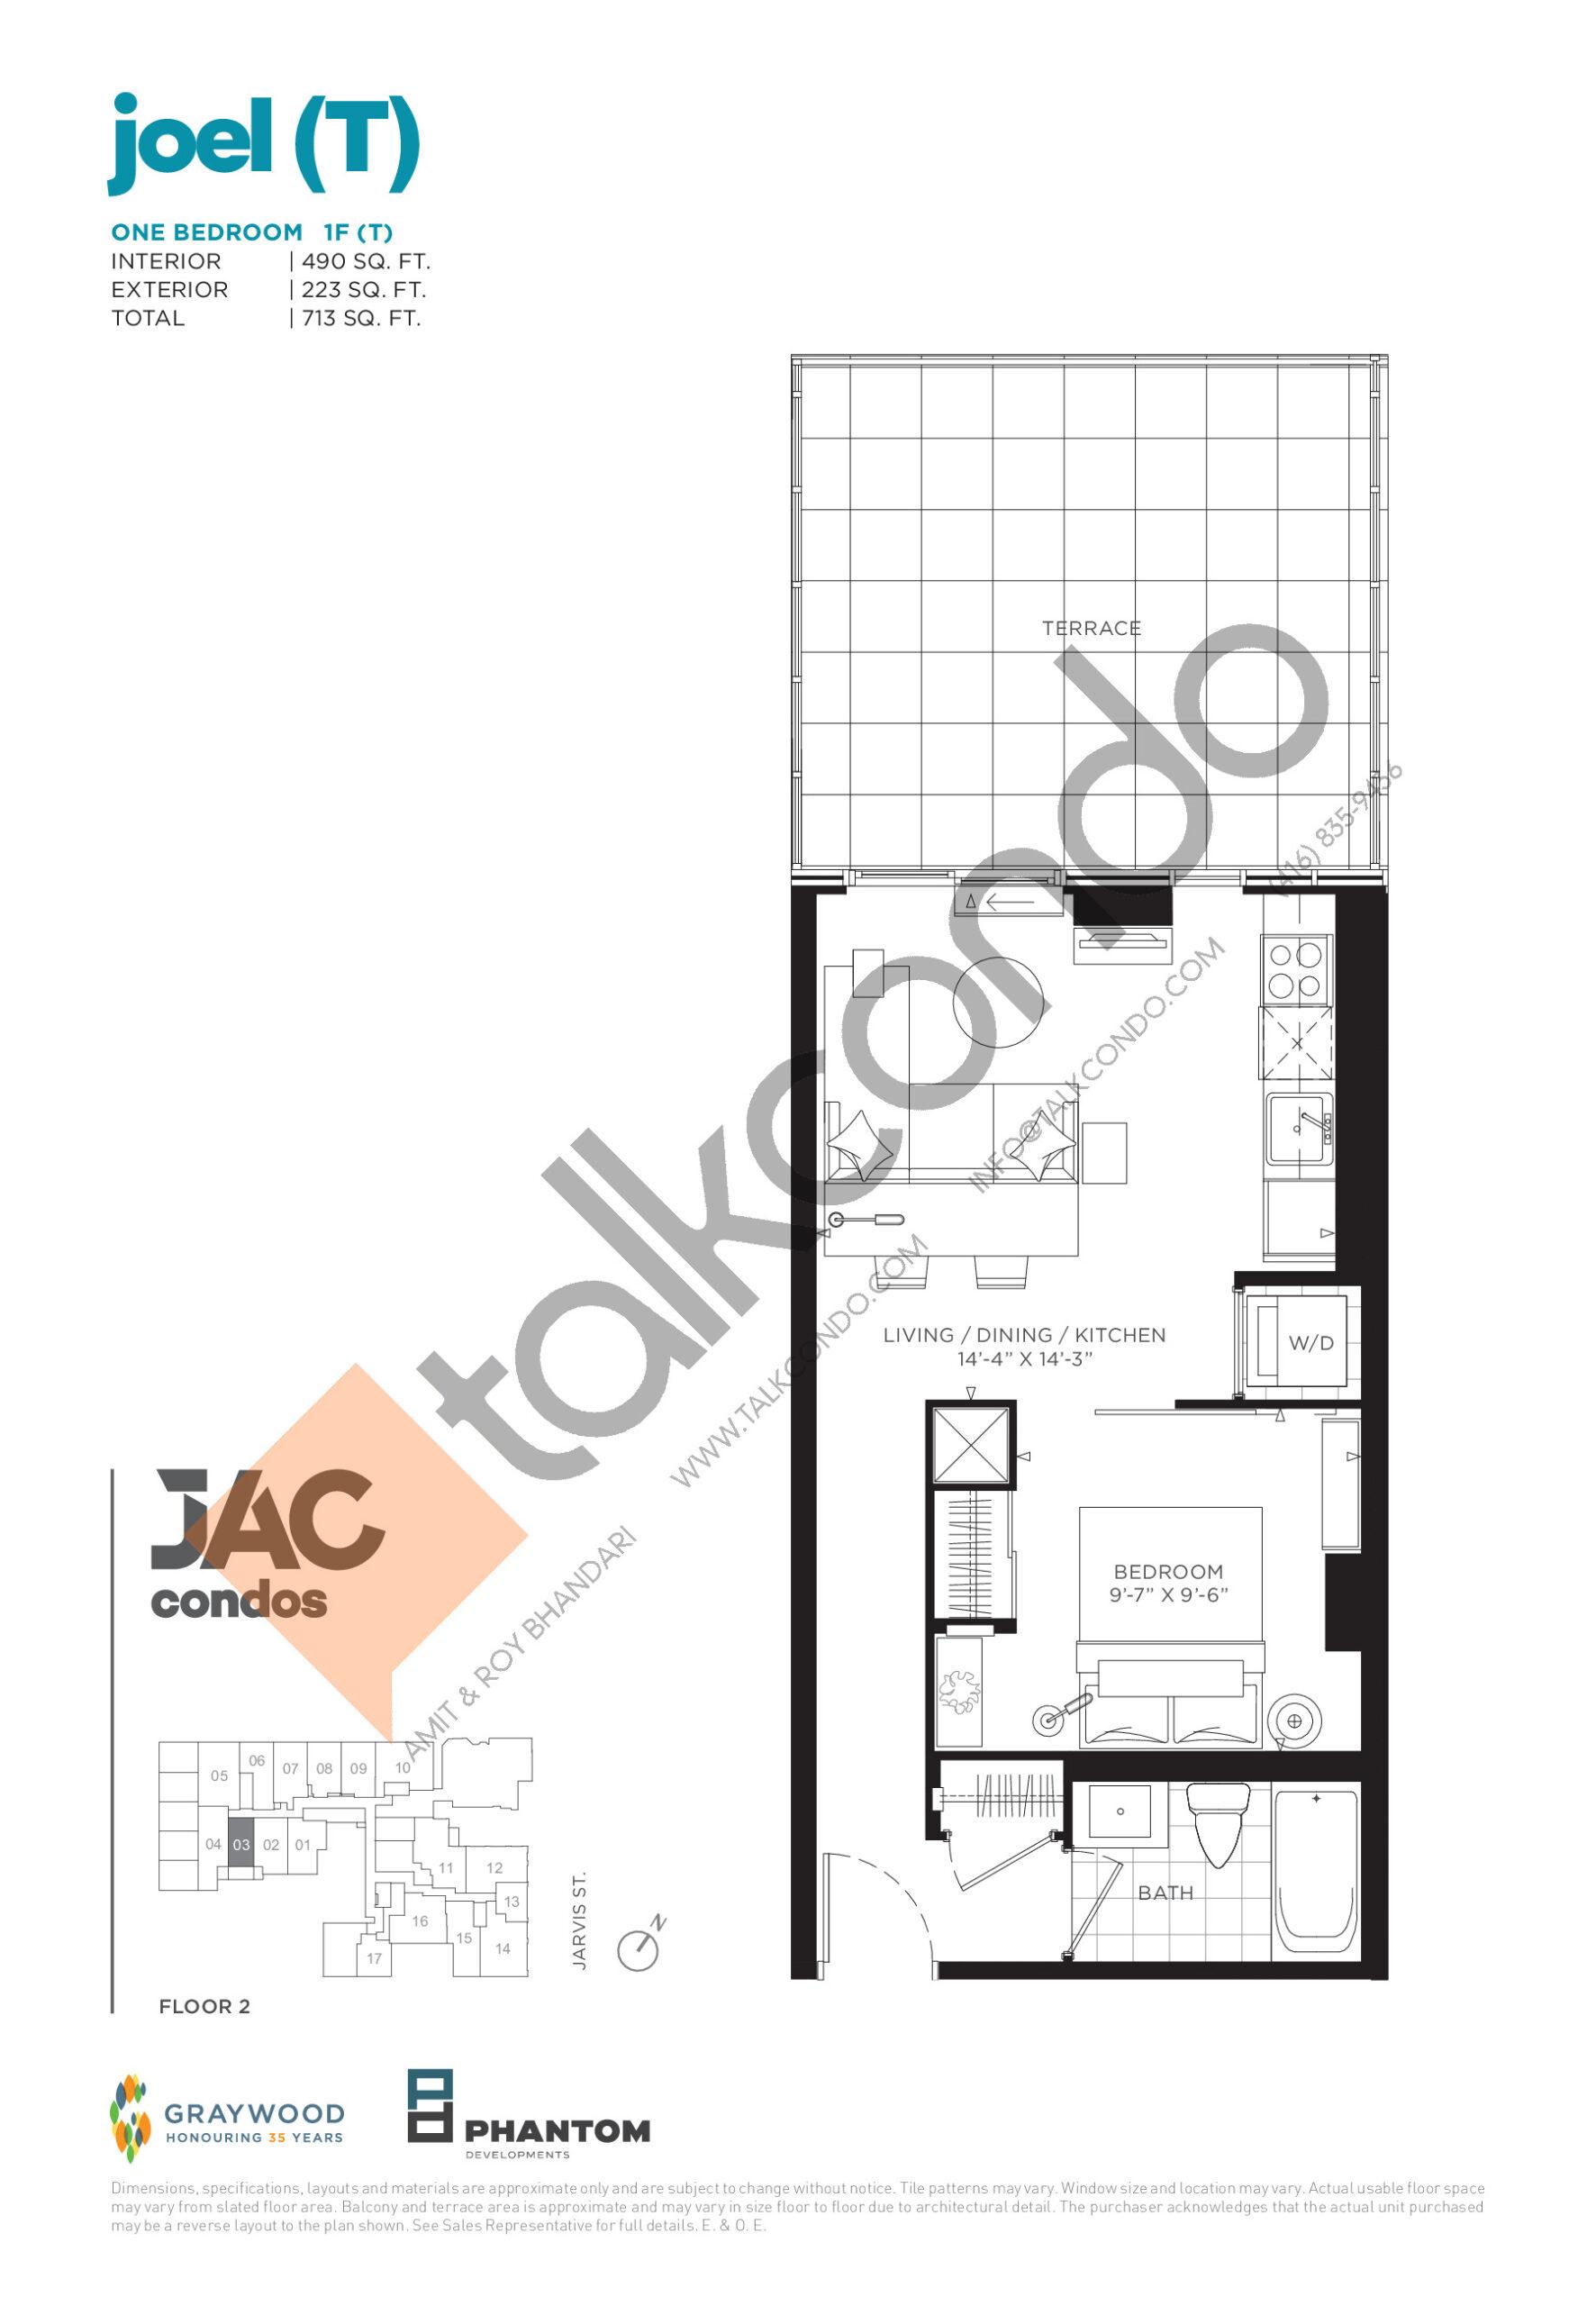 Joel (T) Floor Plan at JAC Condos - 490 sq.ft